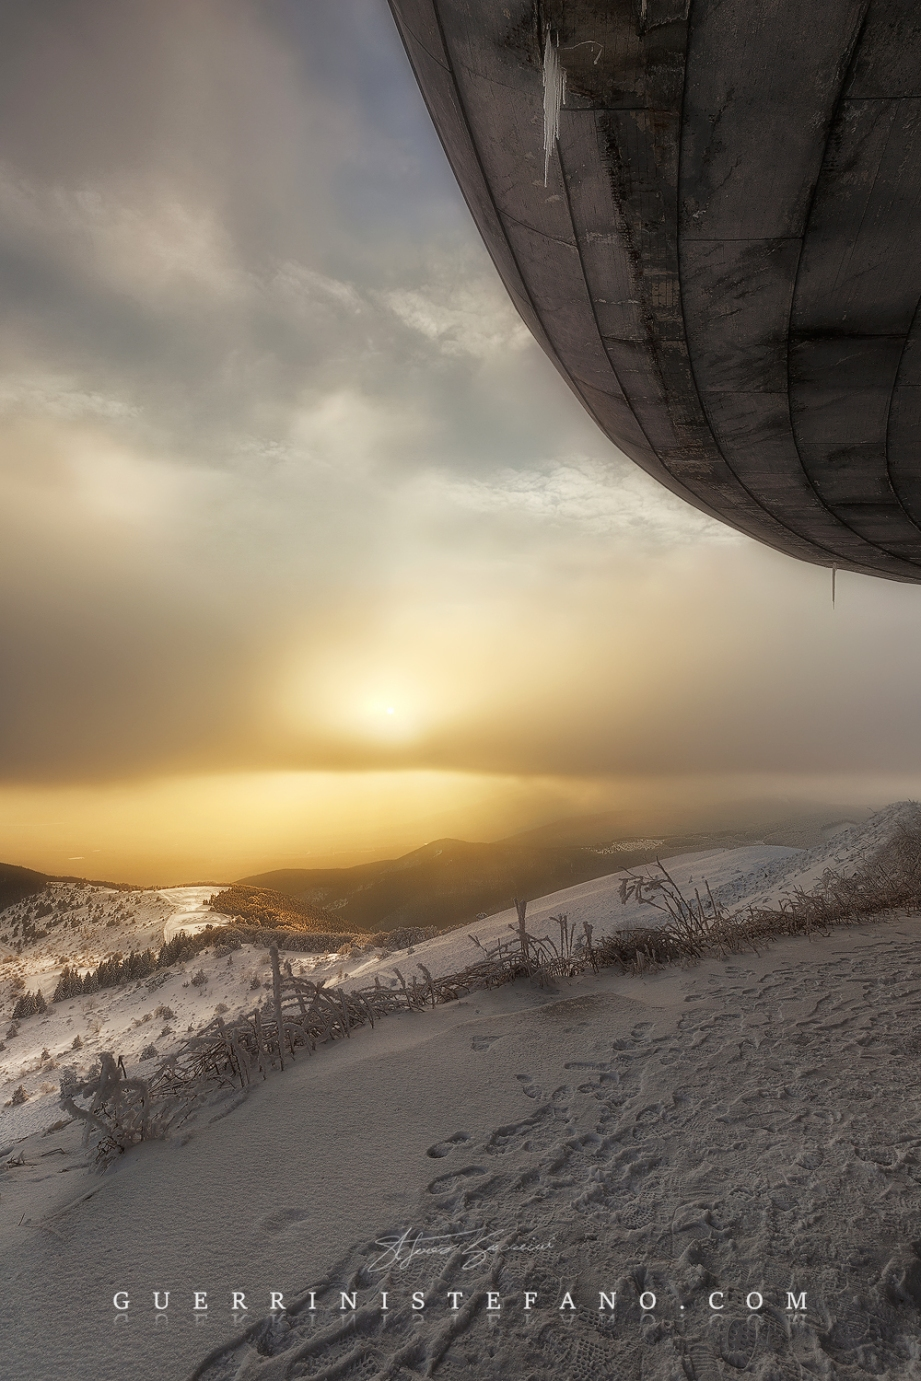 buzludzha-stunning-sunset-1000px-by-guerrini-stefano